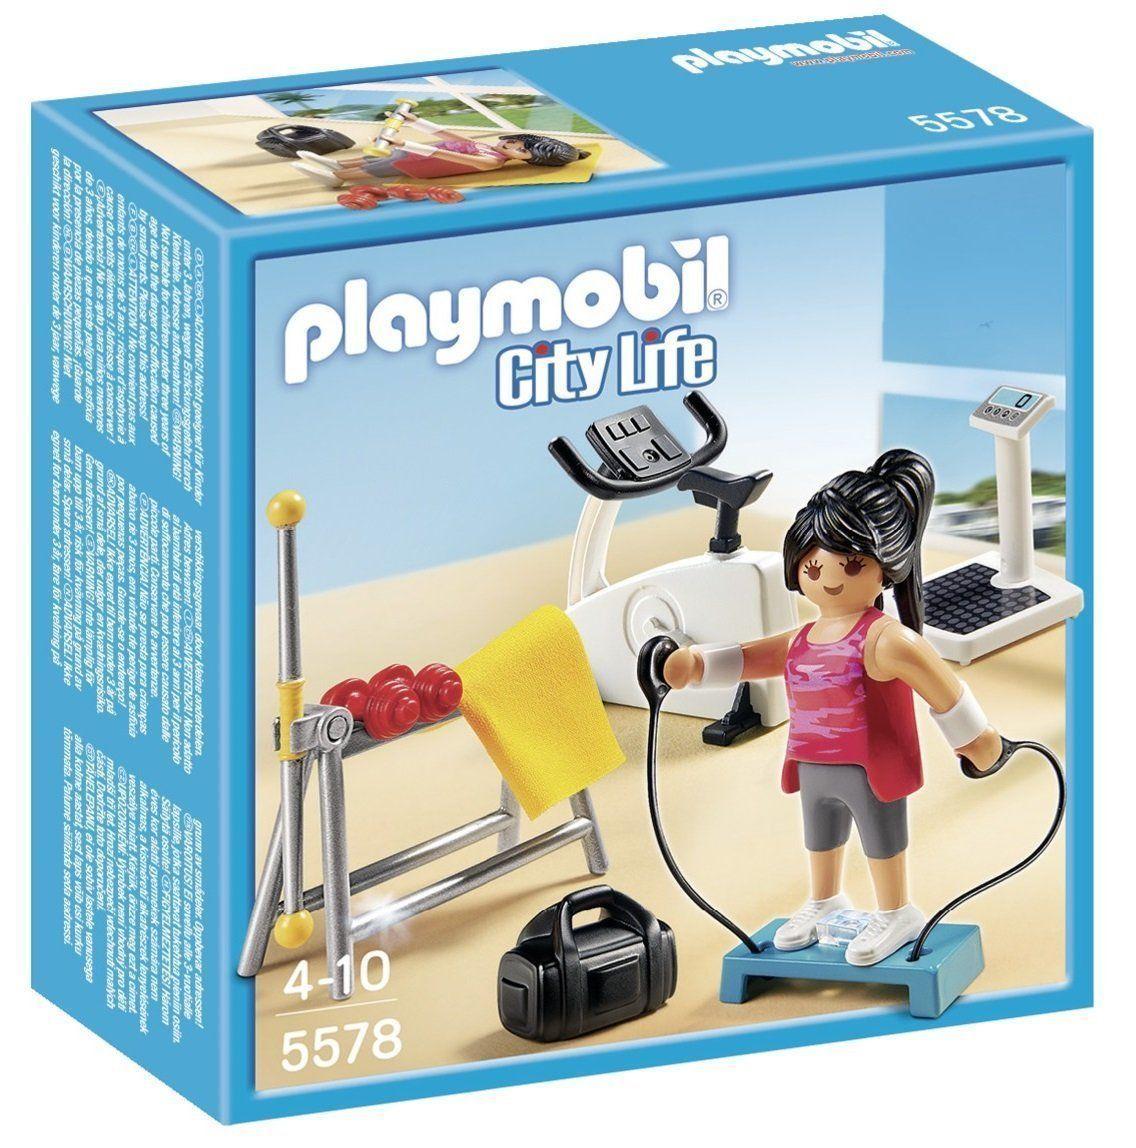 Fitness Room City Life Play SET BY Playmobil 5578 | eBay ...